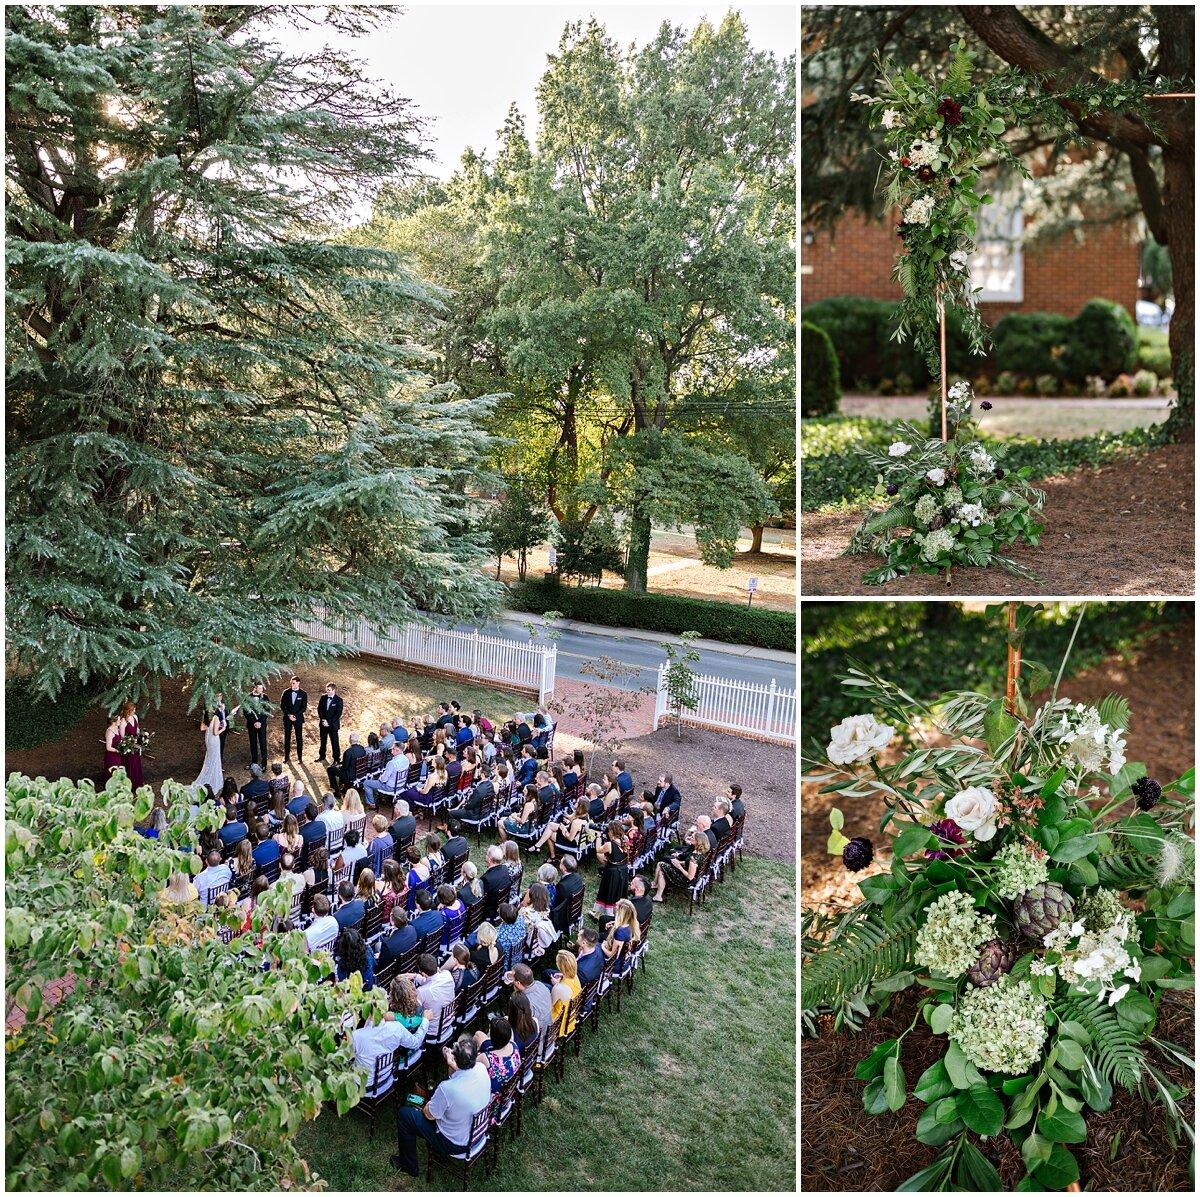 urban-row-photo-ogle-hall-outdoor-ceremony-lawn_0022.jpg